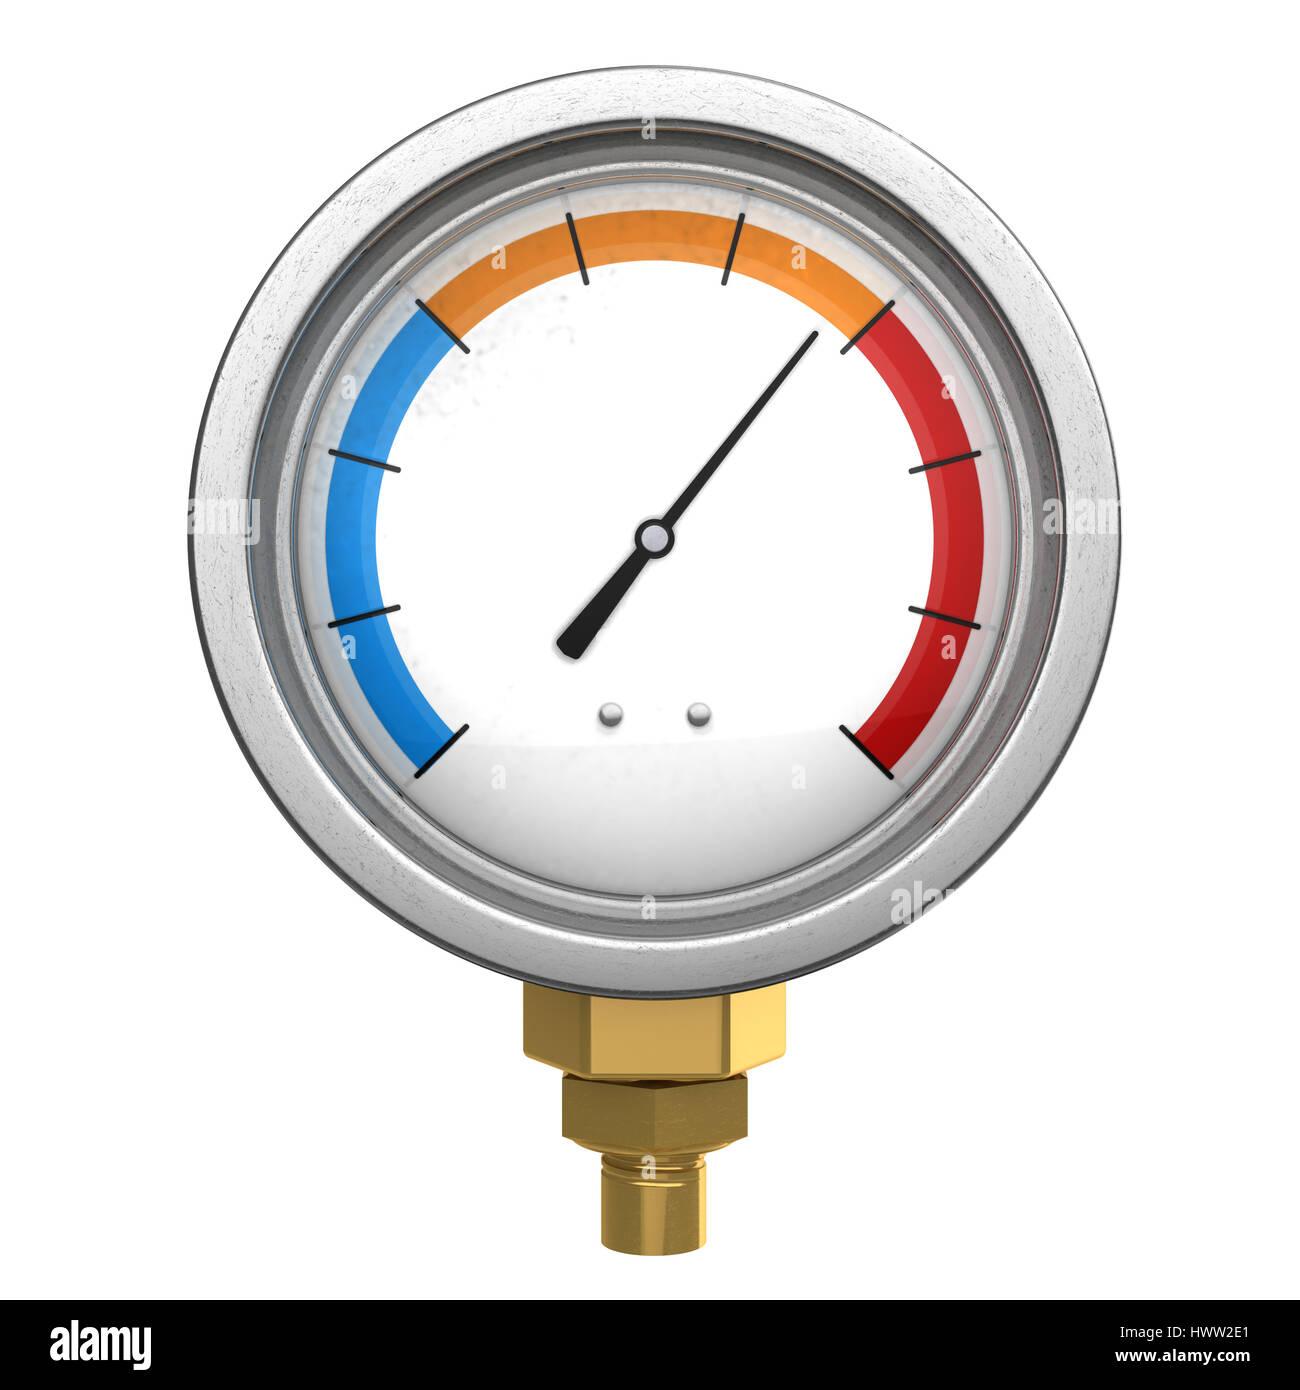 3d illustration of manometer or water temperature meter - Stock Image